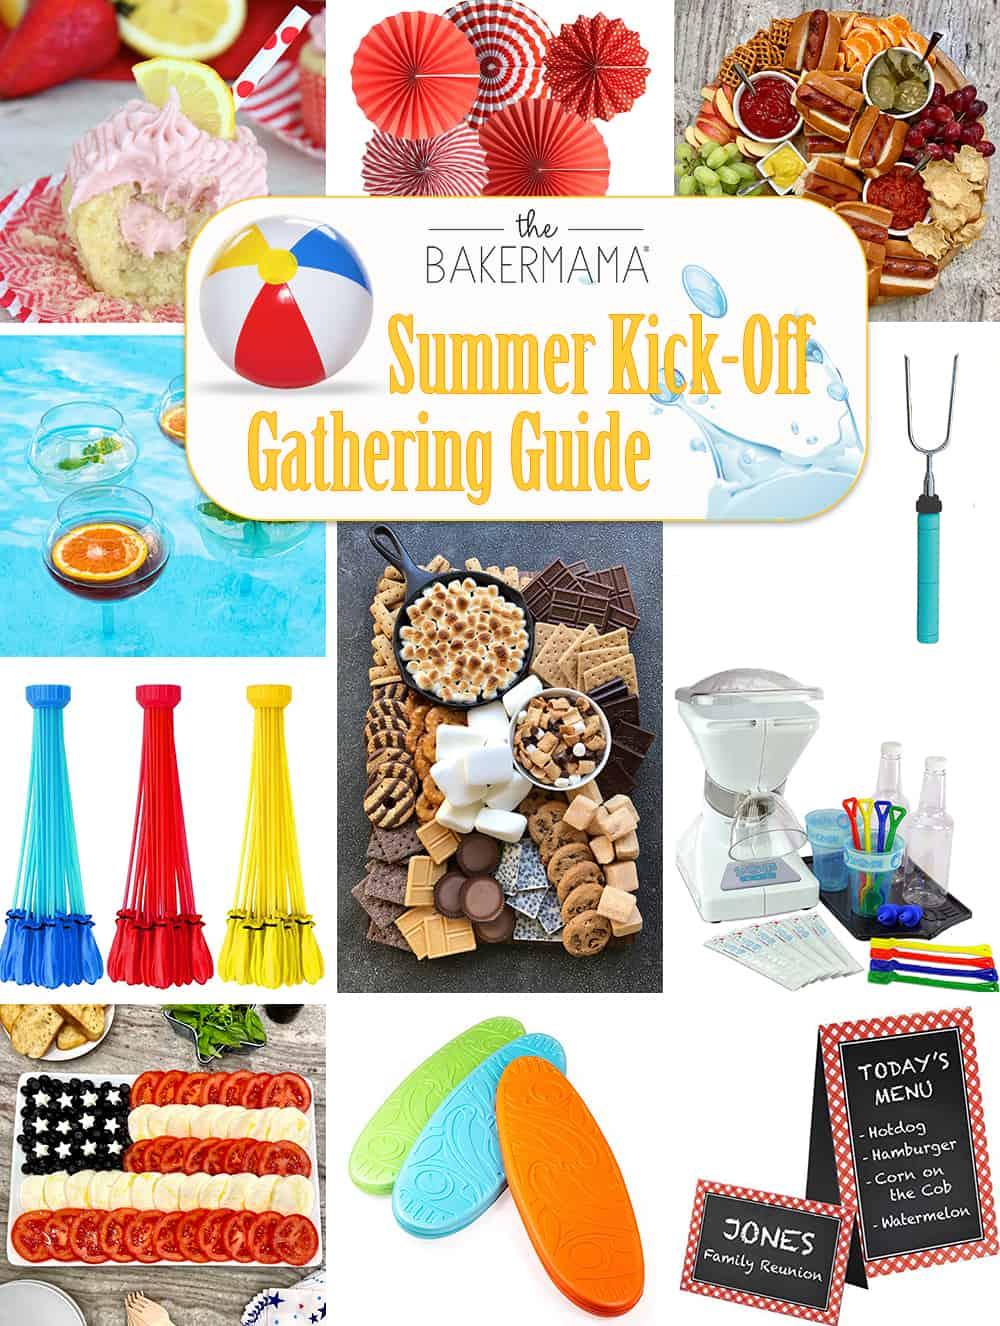 Summer Kick-Off Gathering Guide